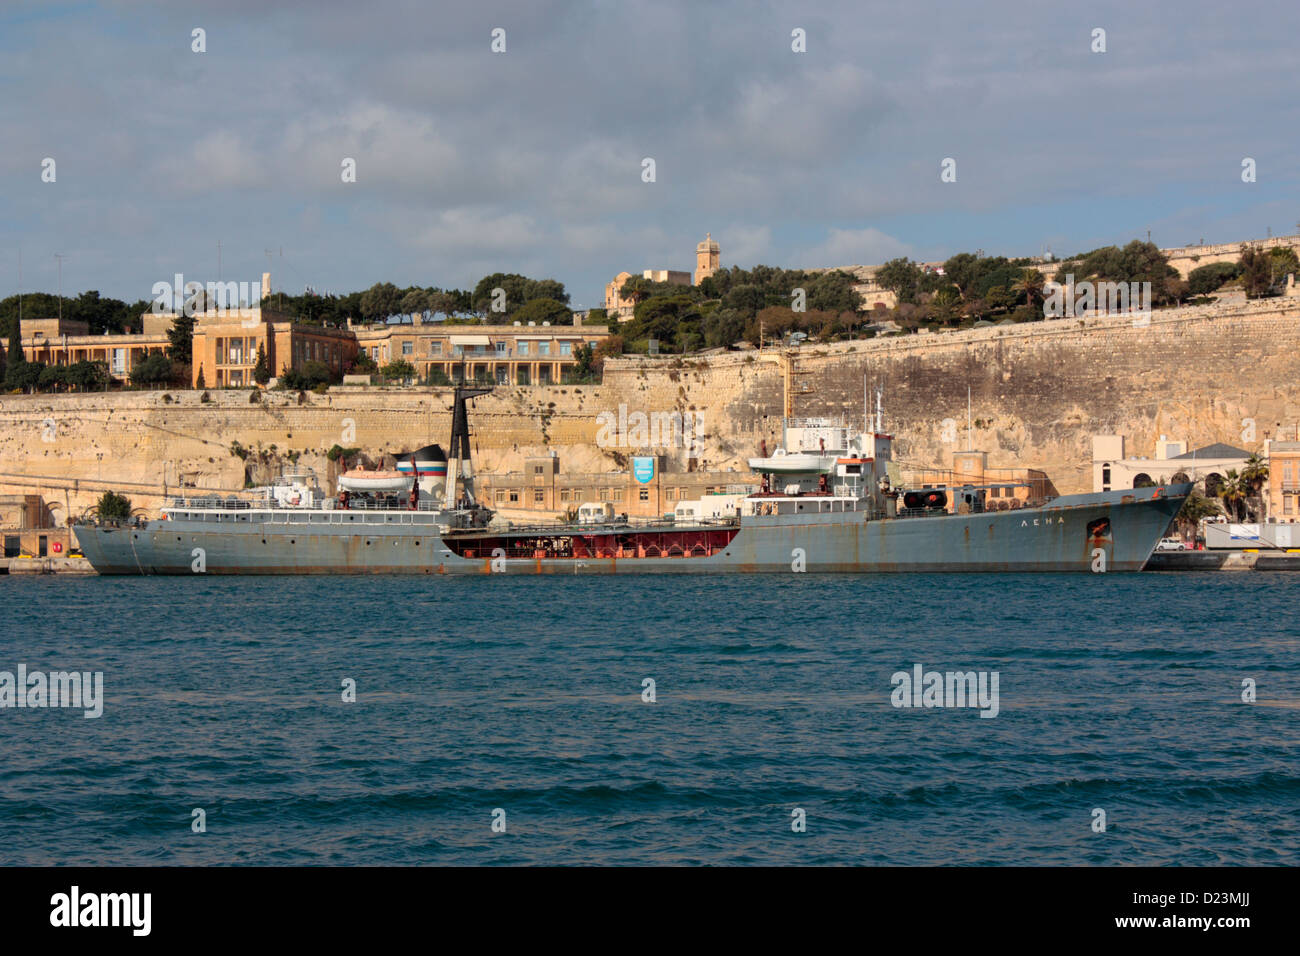 The Russian Navy tanker Lena in Malta - Stock Image